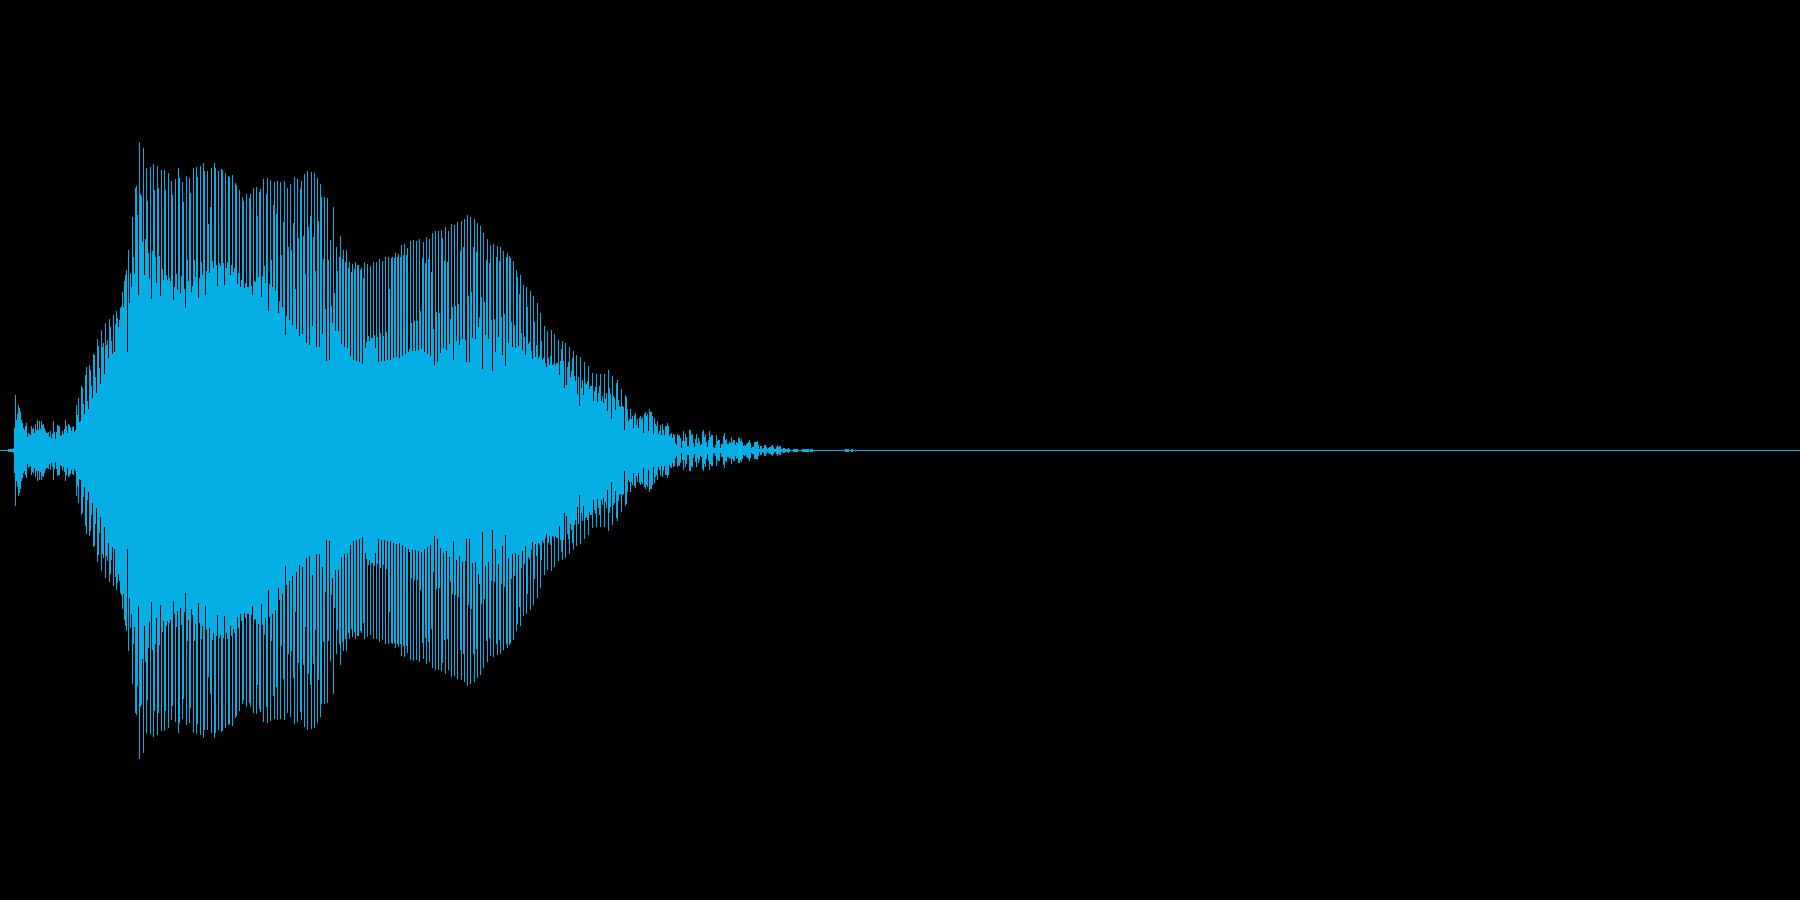 Tの再生済みの波形